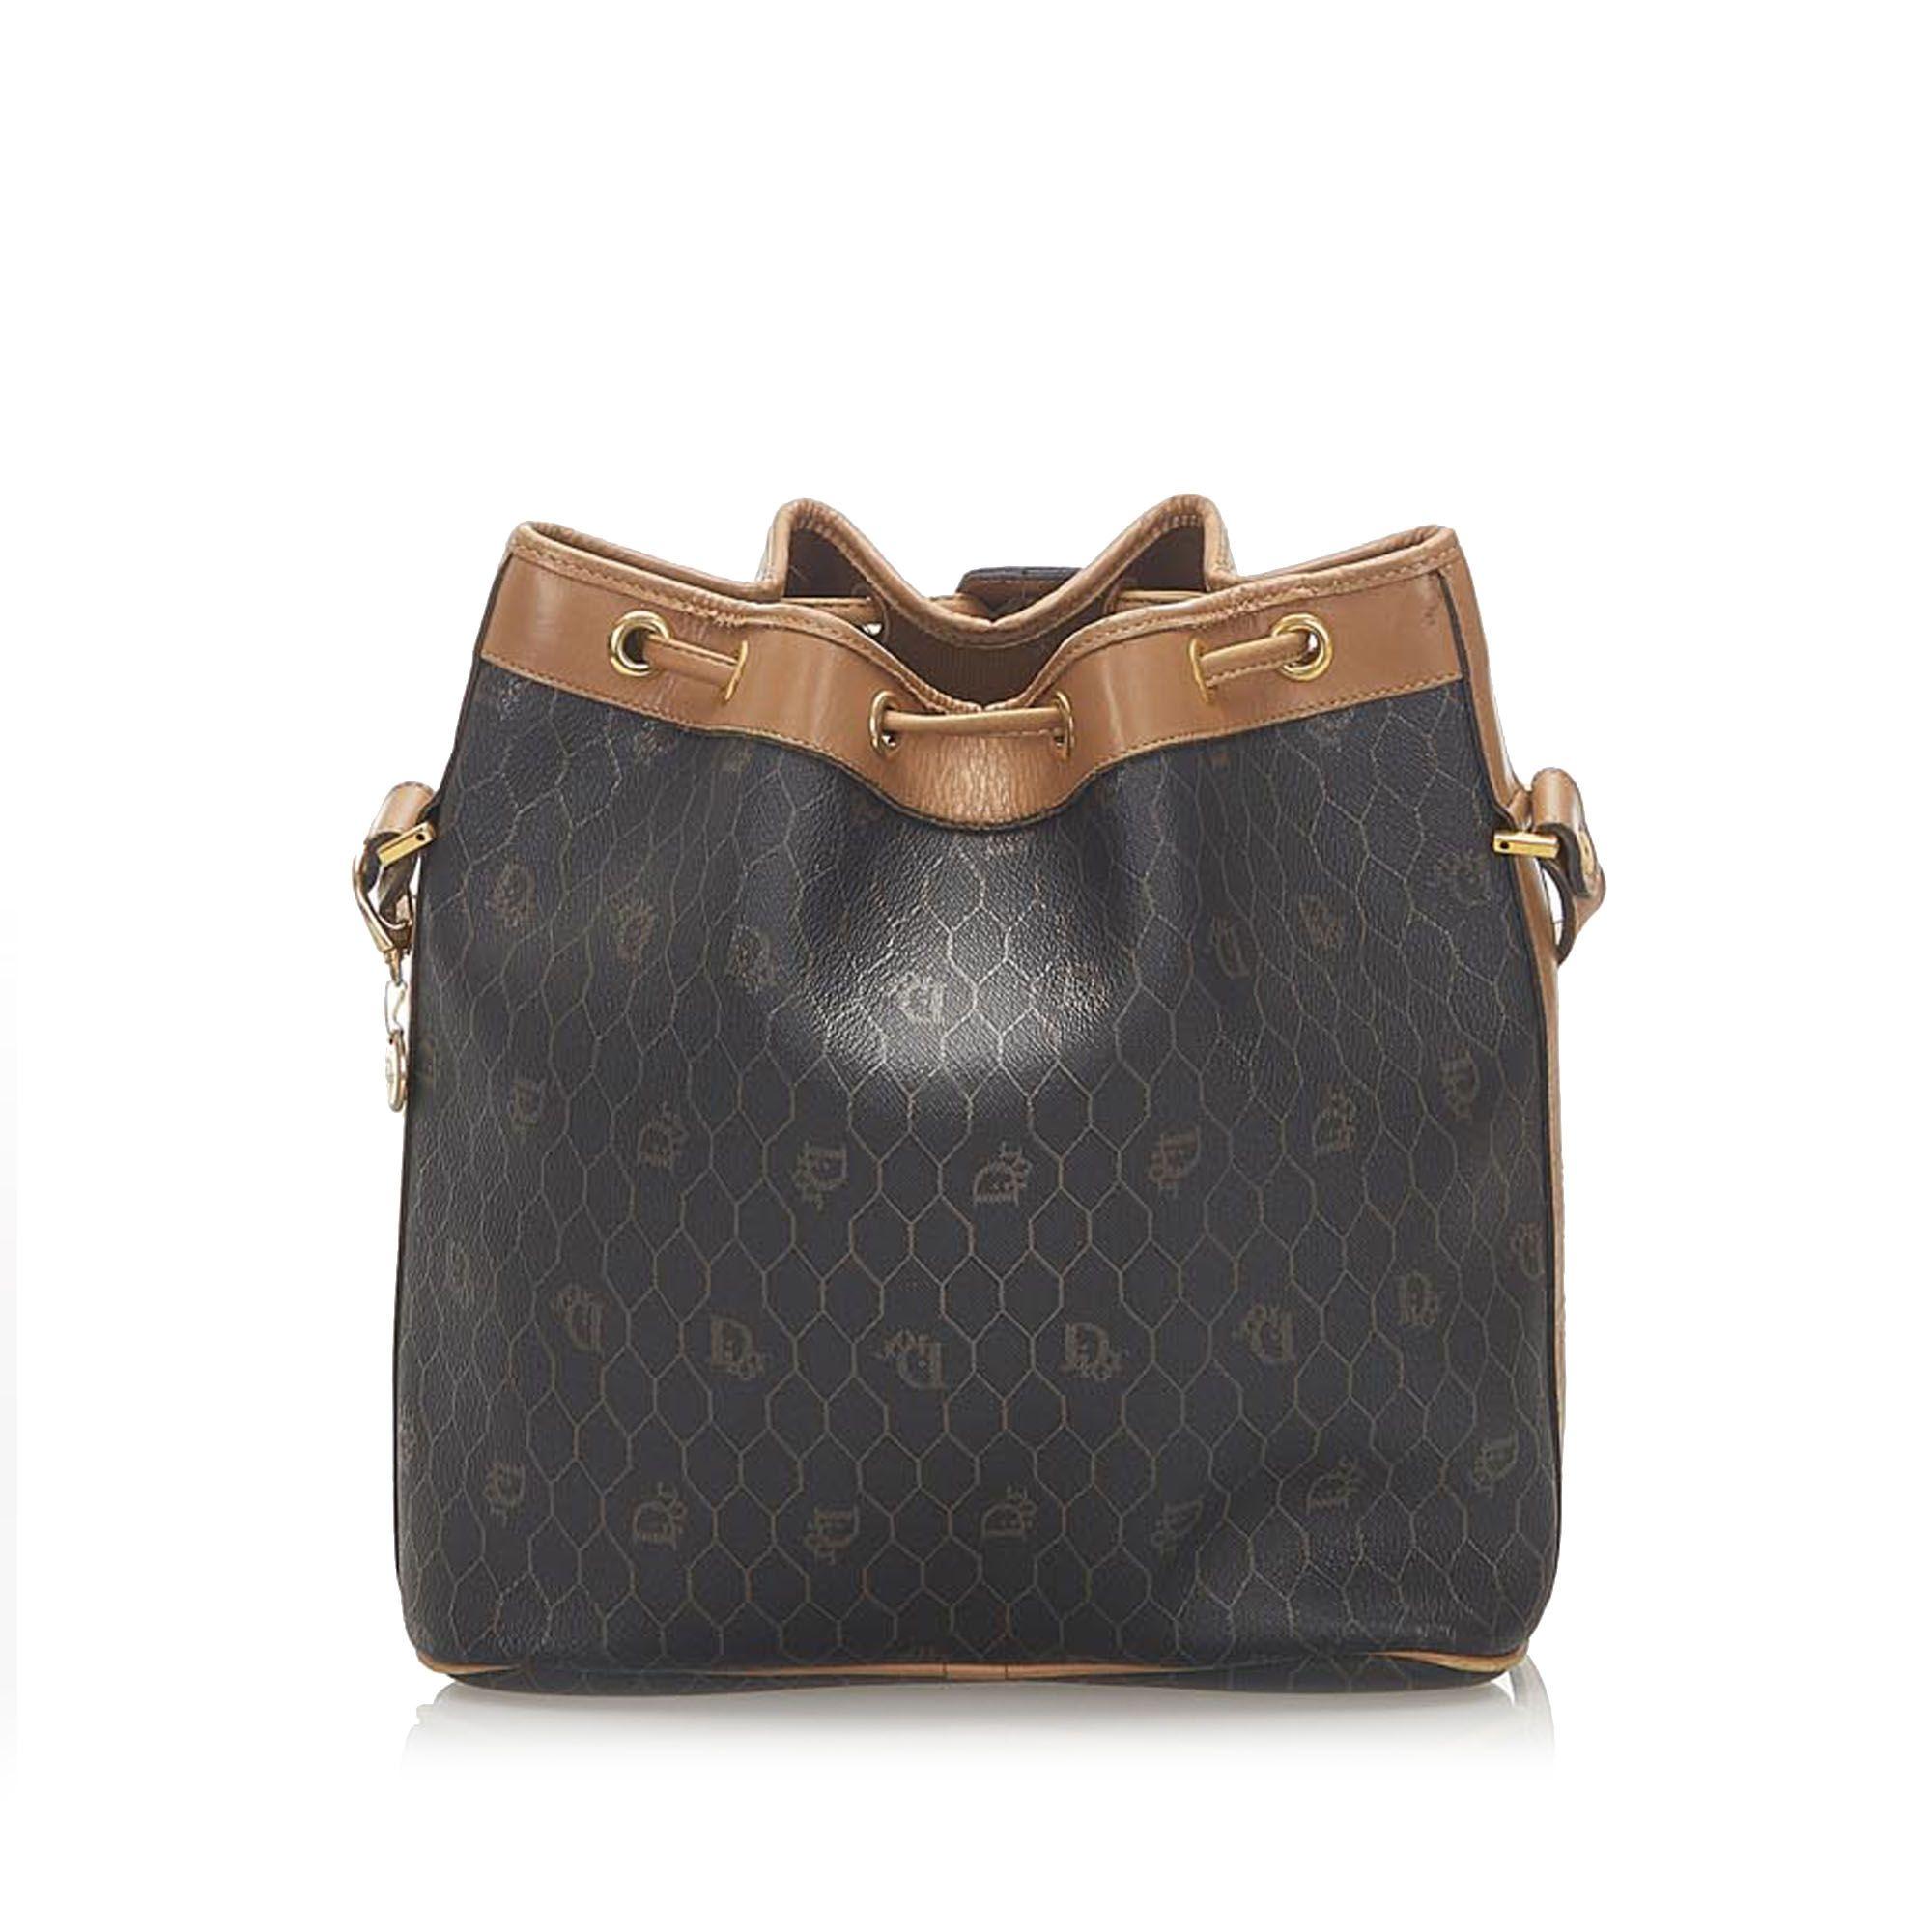 Vintage Dior Honeycomb Coated Canvas Bucket Bag Black